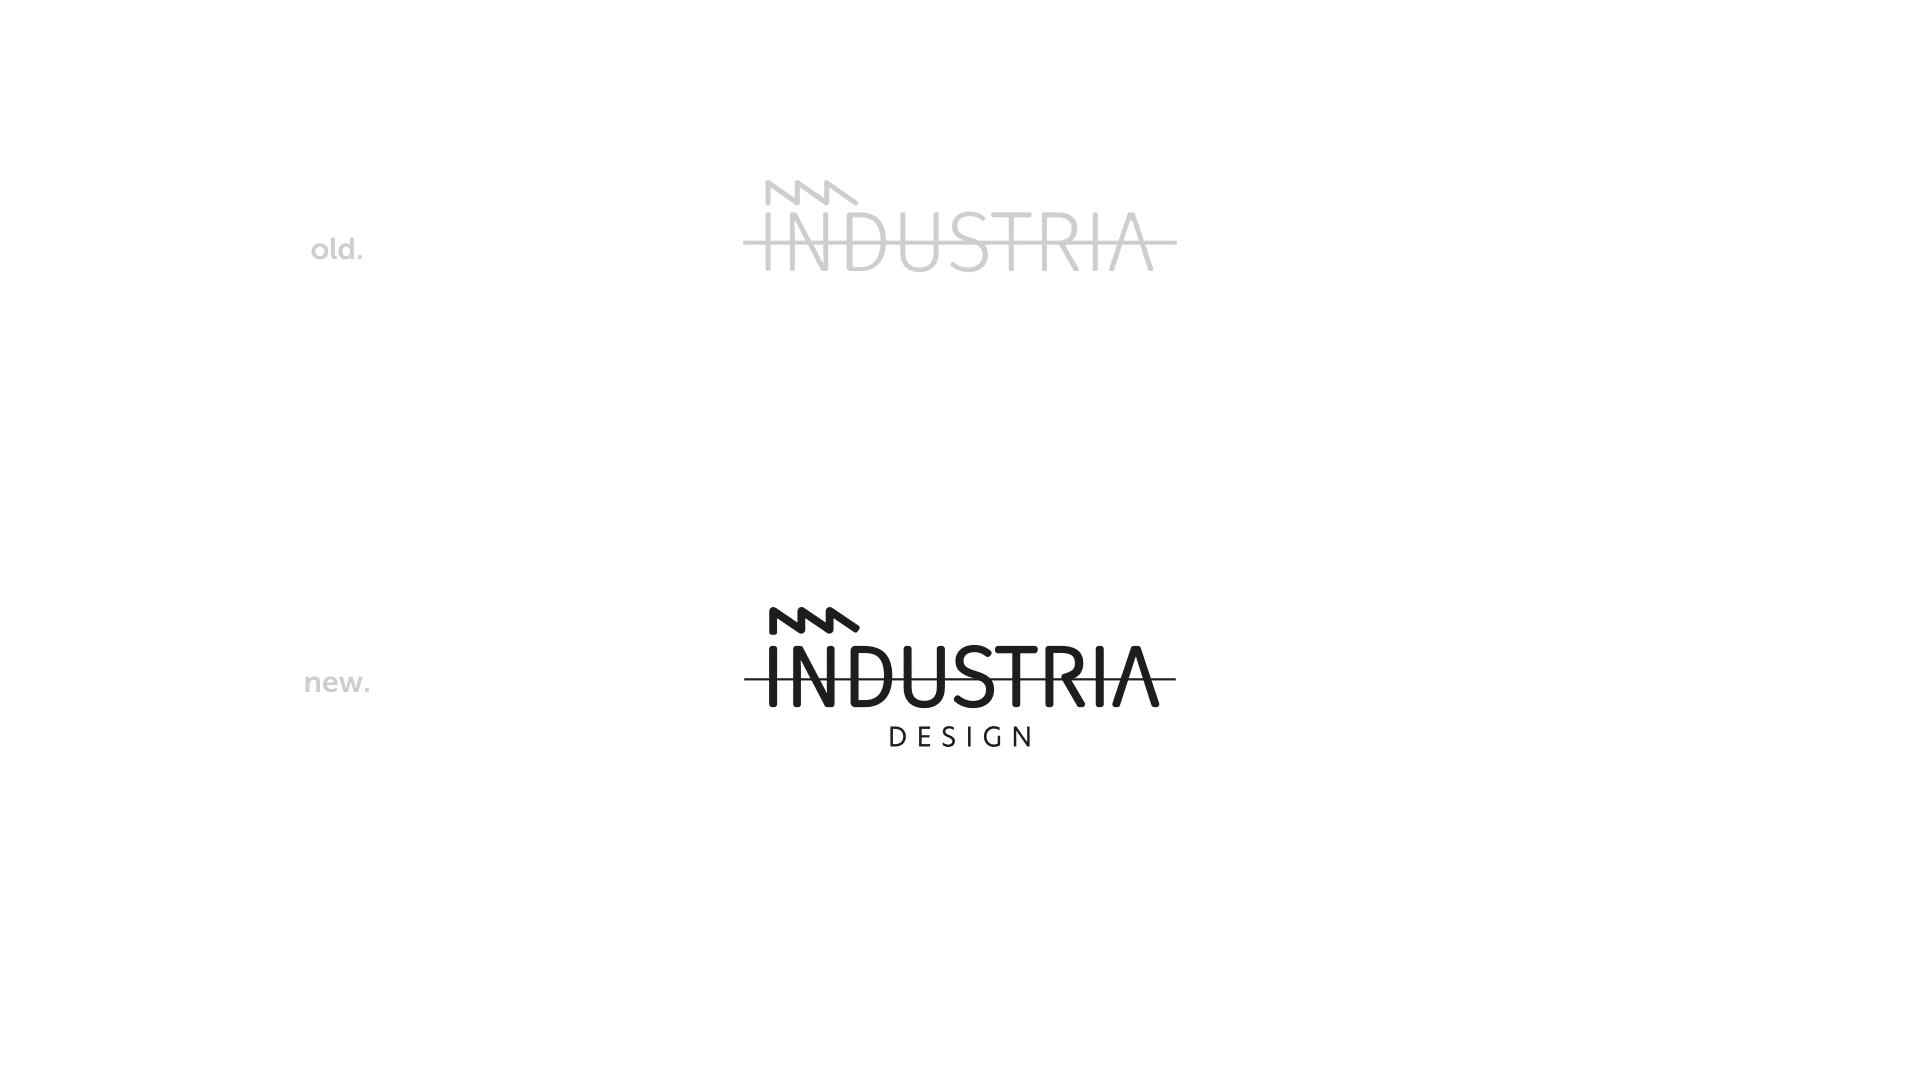 industria design logo refresh 01